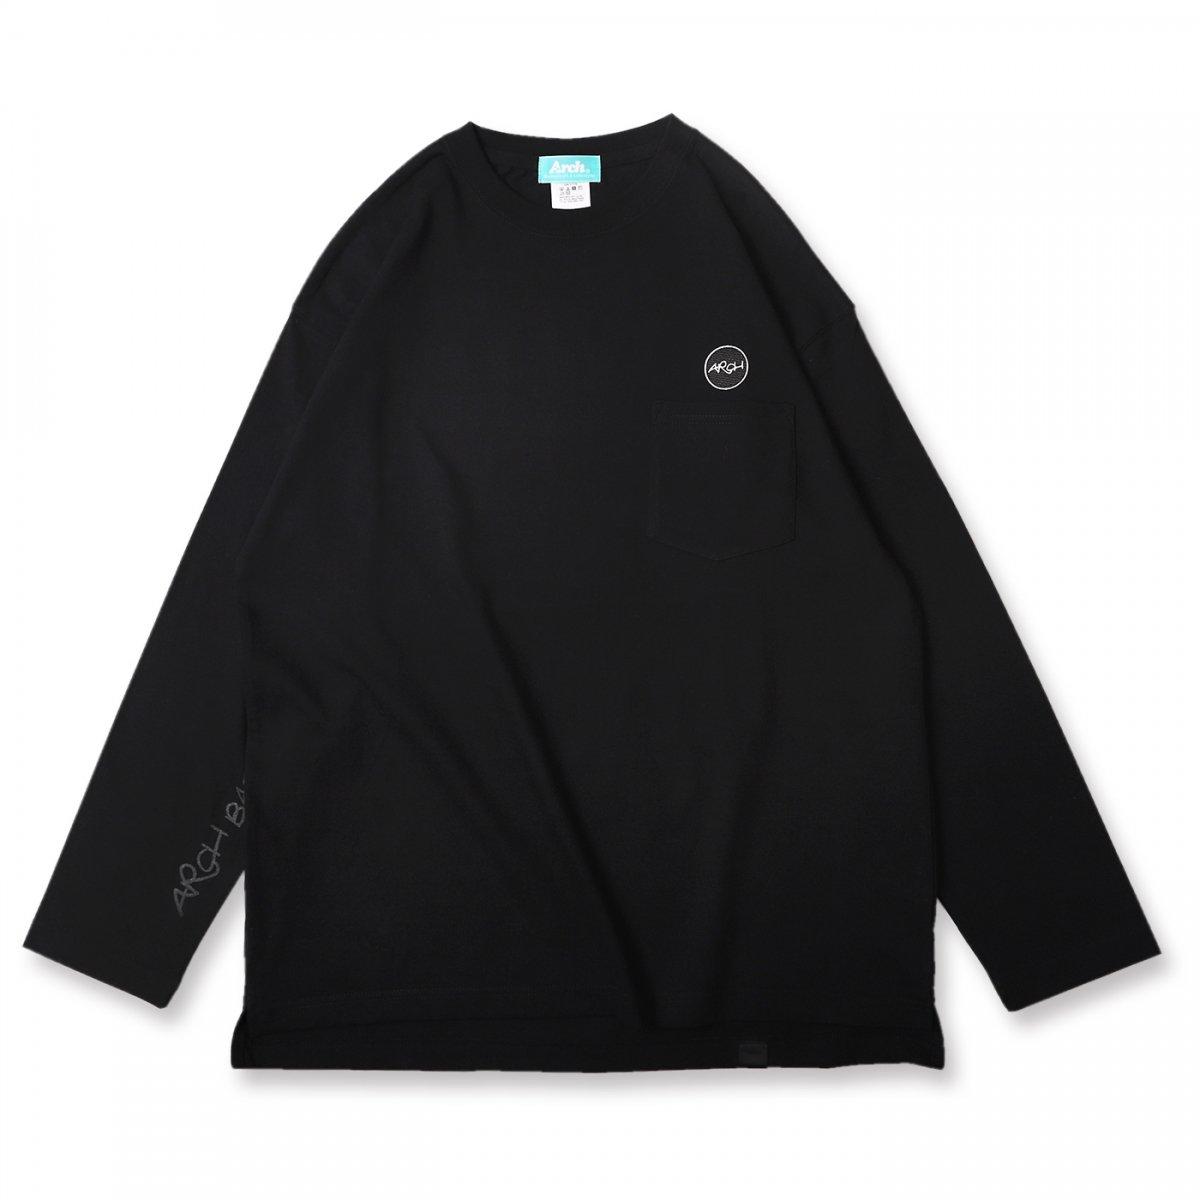 patched pocket L/S tee【black】